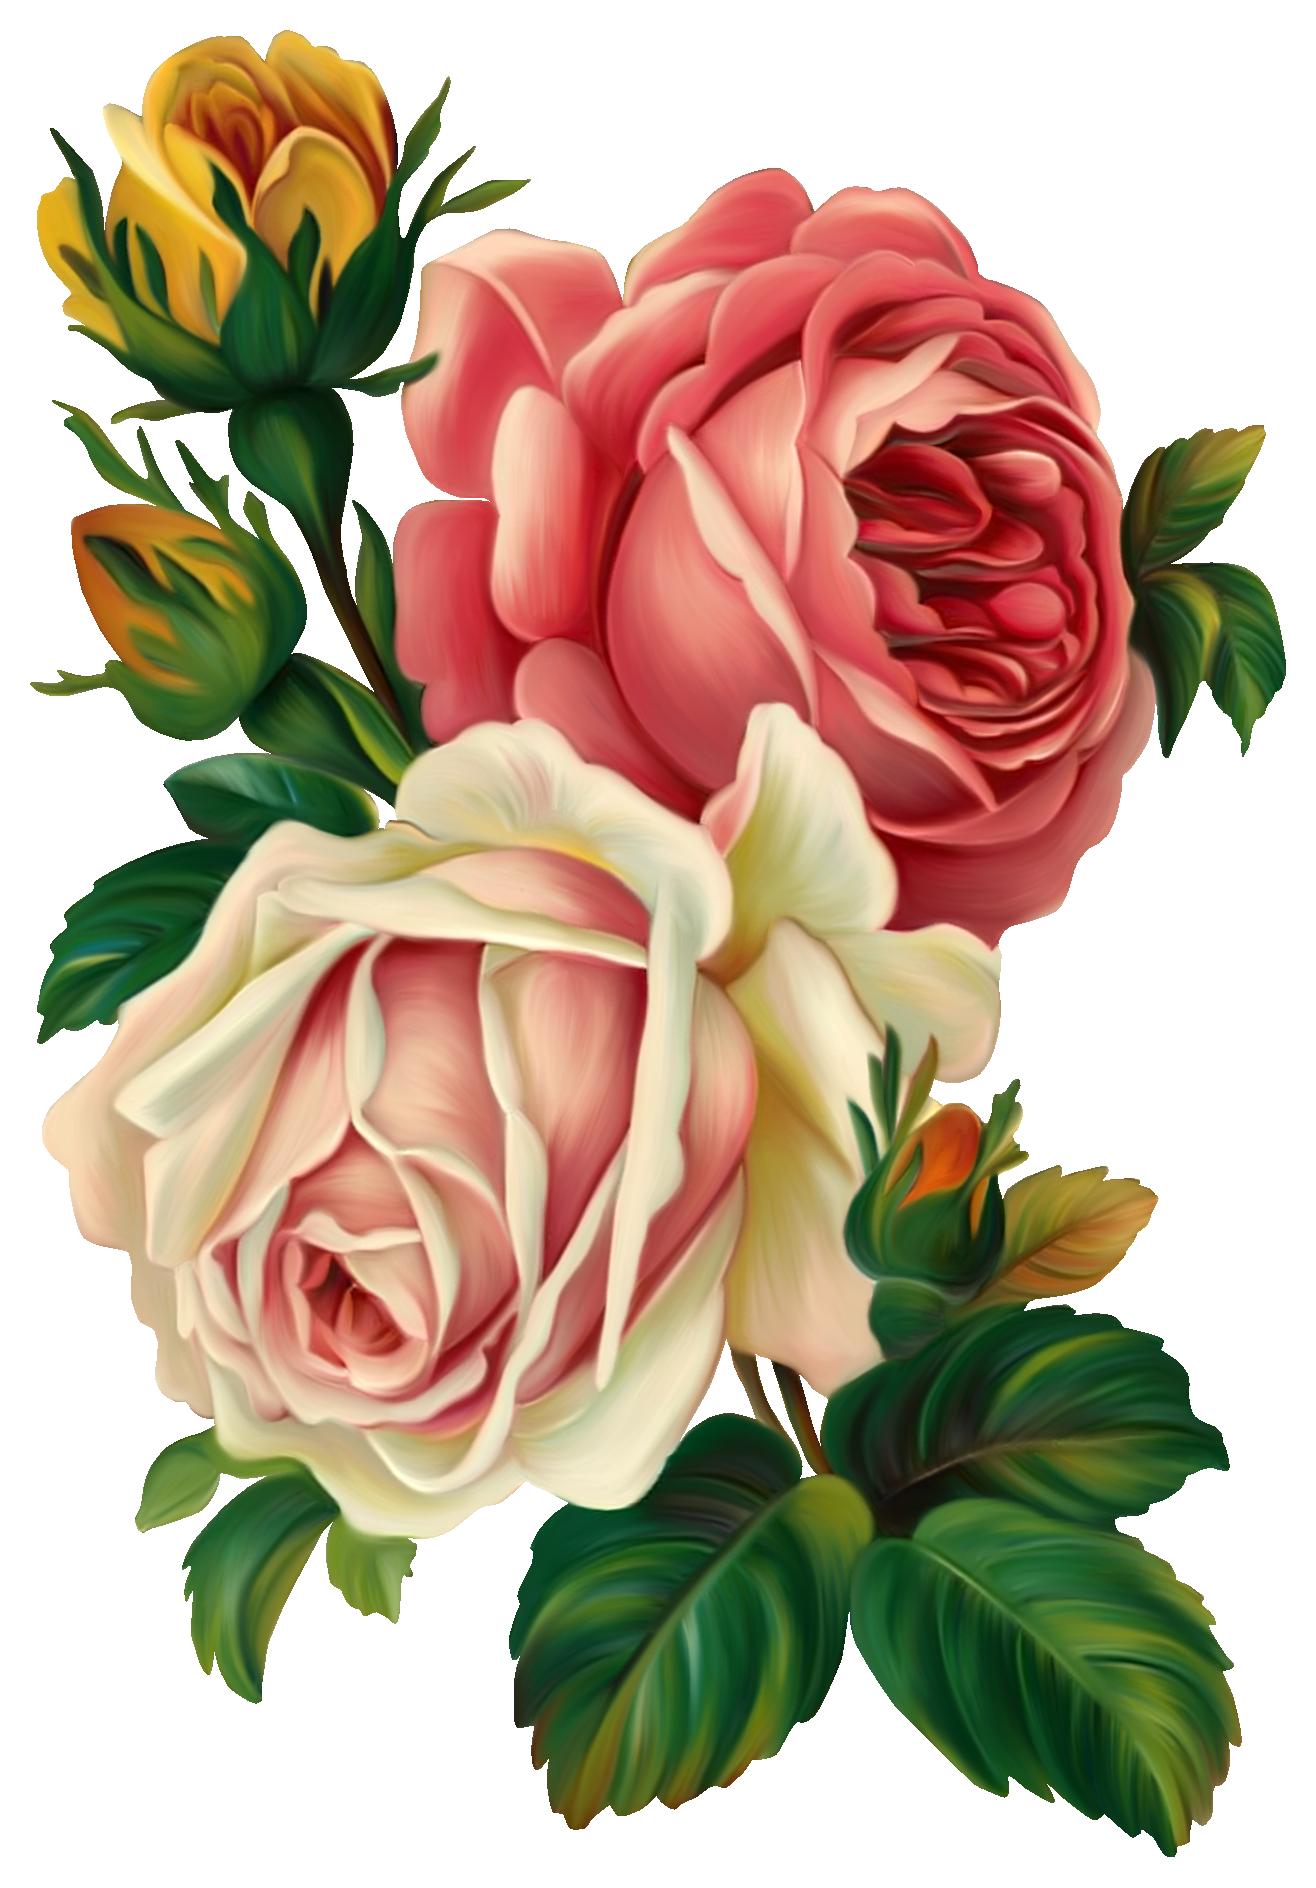 C utare google drawing. Flower clipart vintage